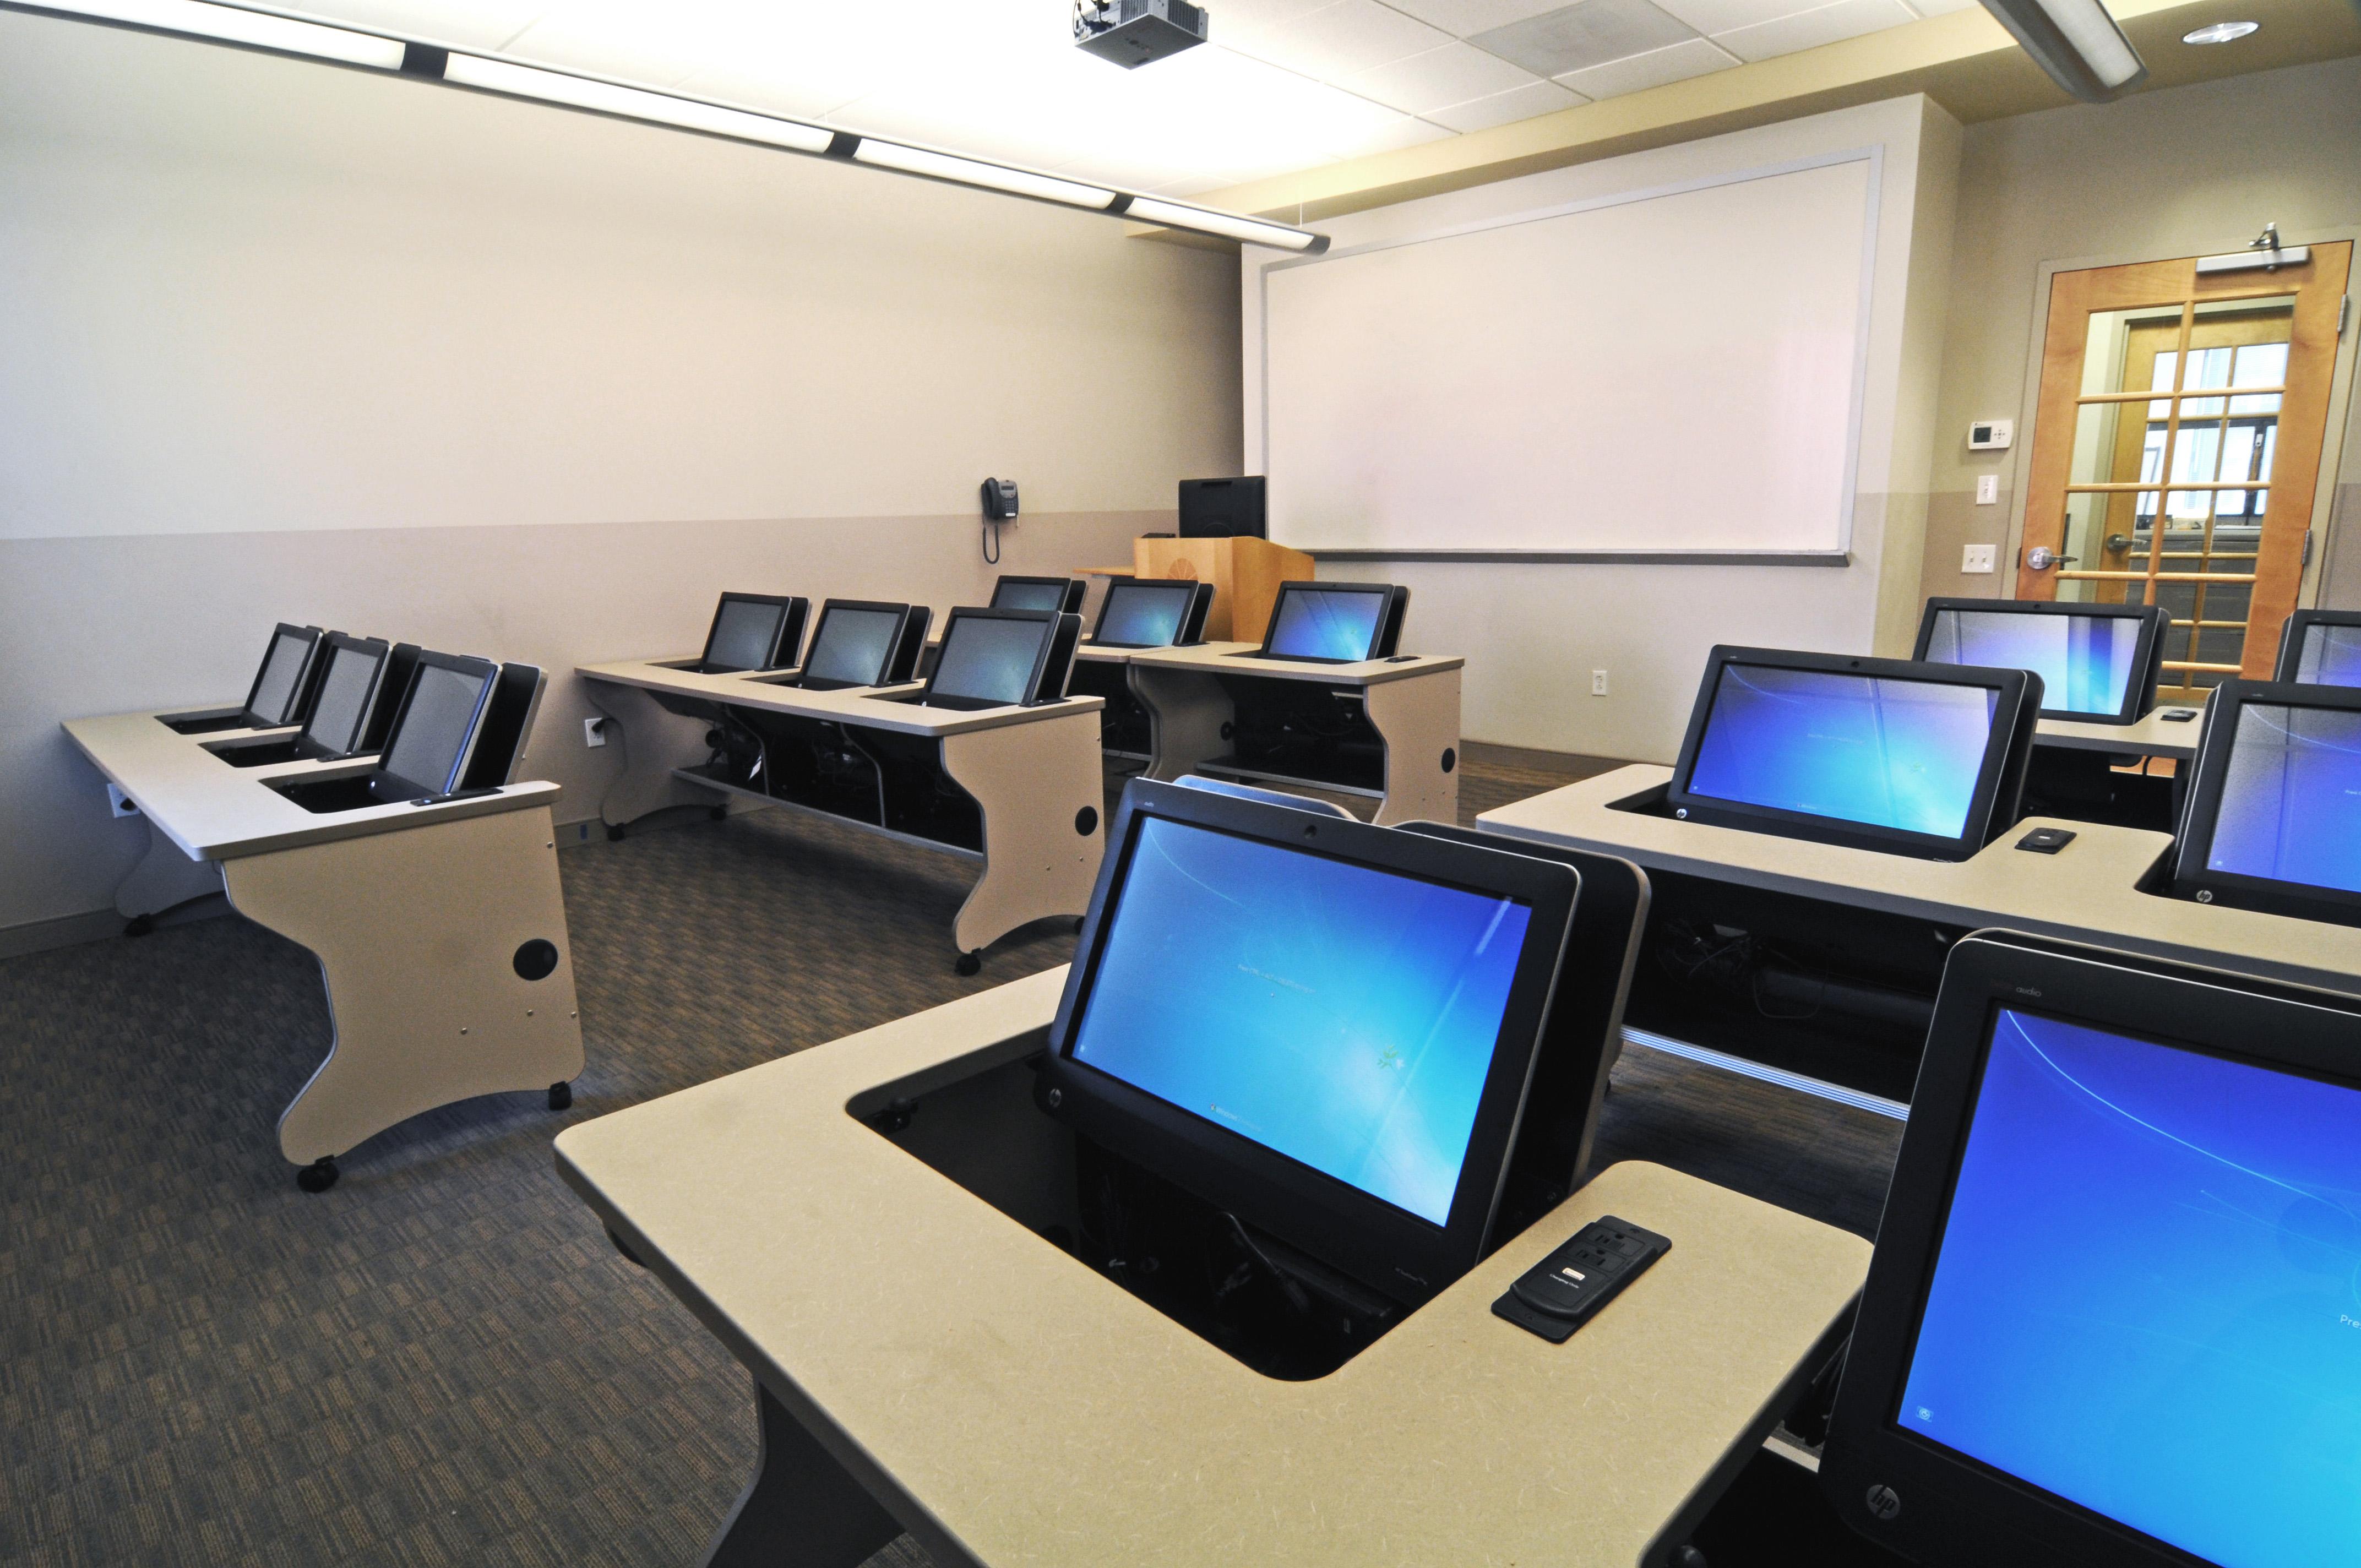 Ilid Touch All Inone Computer Desks Smartdesks Gives Multi